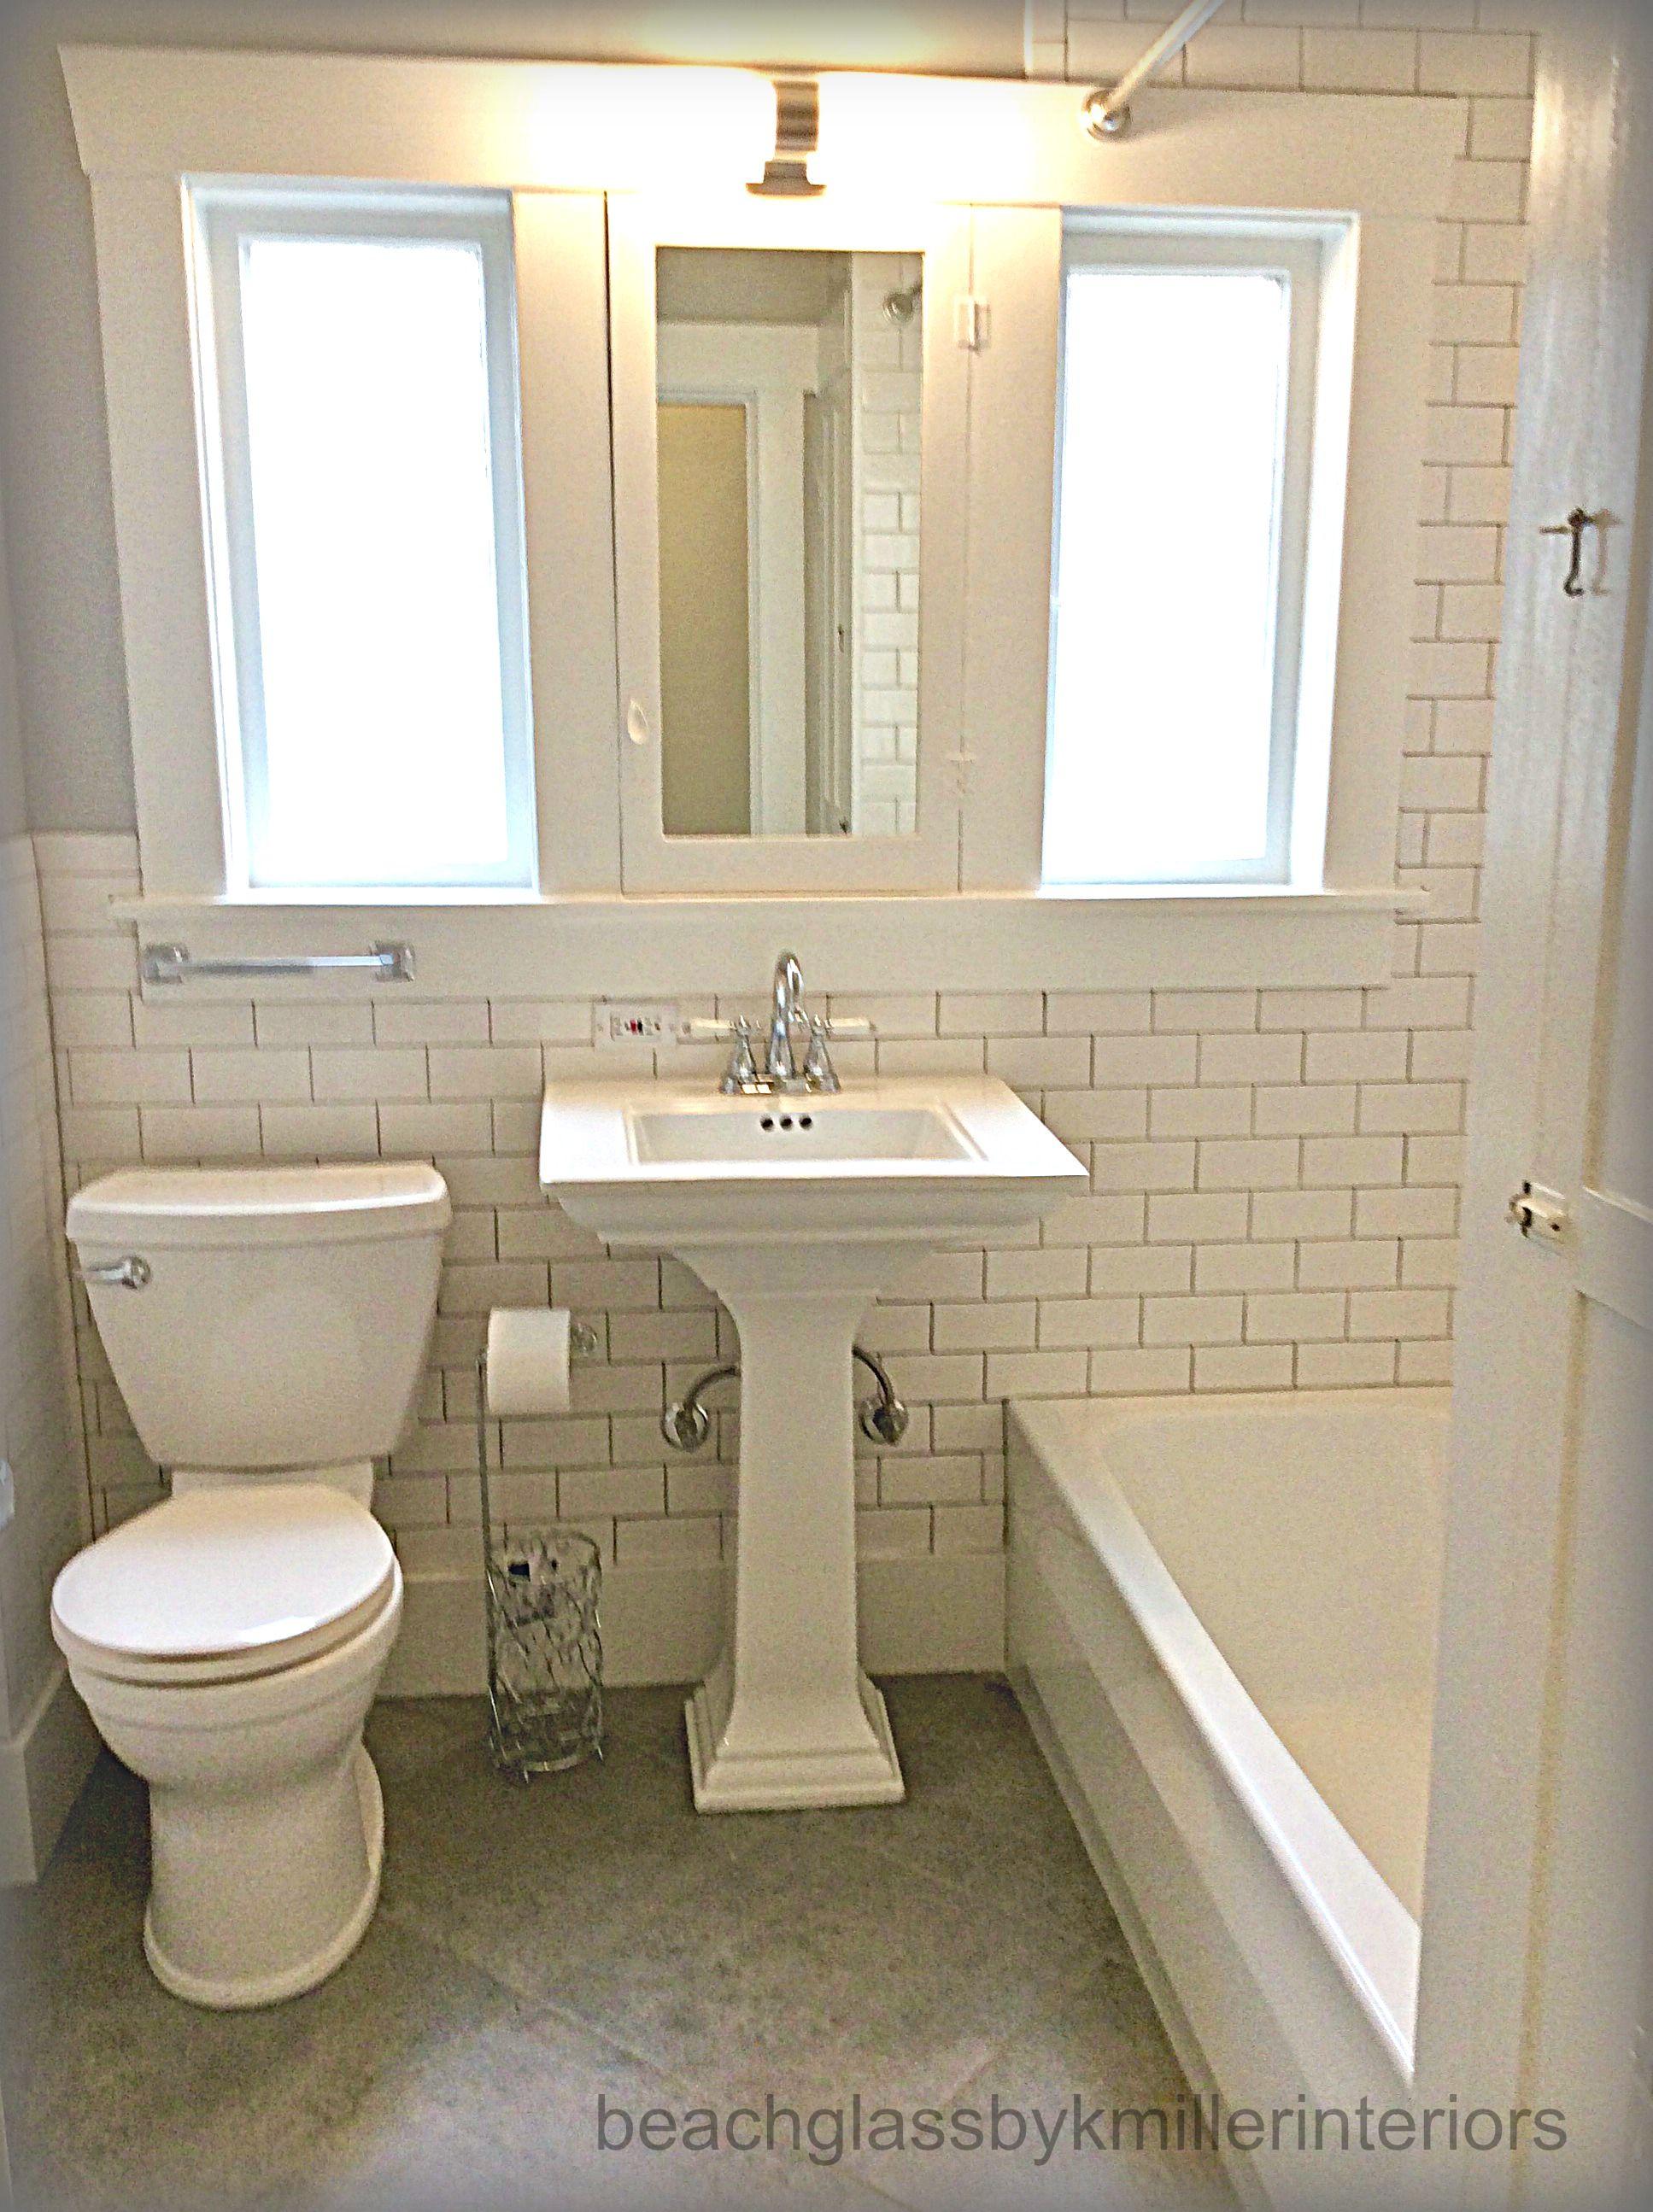 Bathroom Remodeling Seattle pinbeach glass by k.miller interiors on seattle bathroom